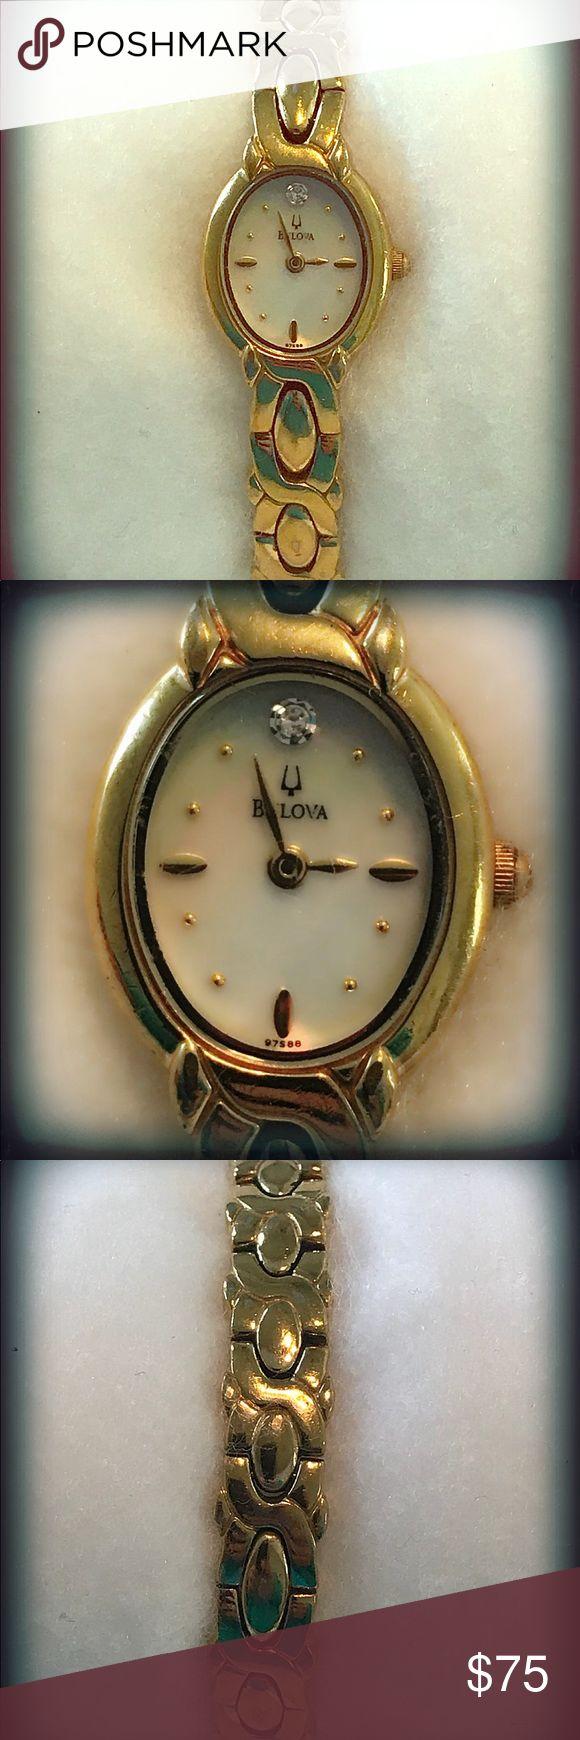 Ladies Bulova Watch Gold Tone Women's Bulova Watch with Opal Face. Bulova Accessories Watches